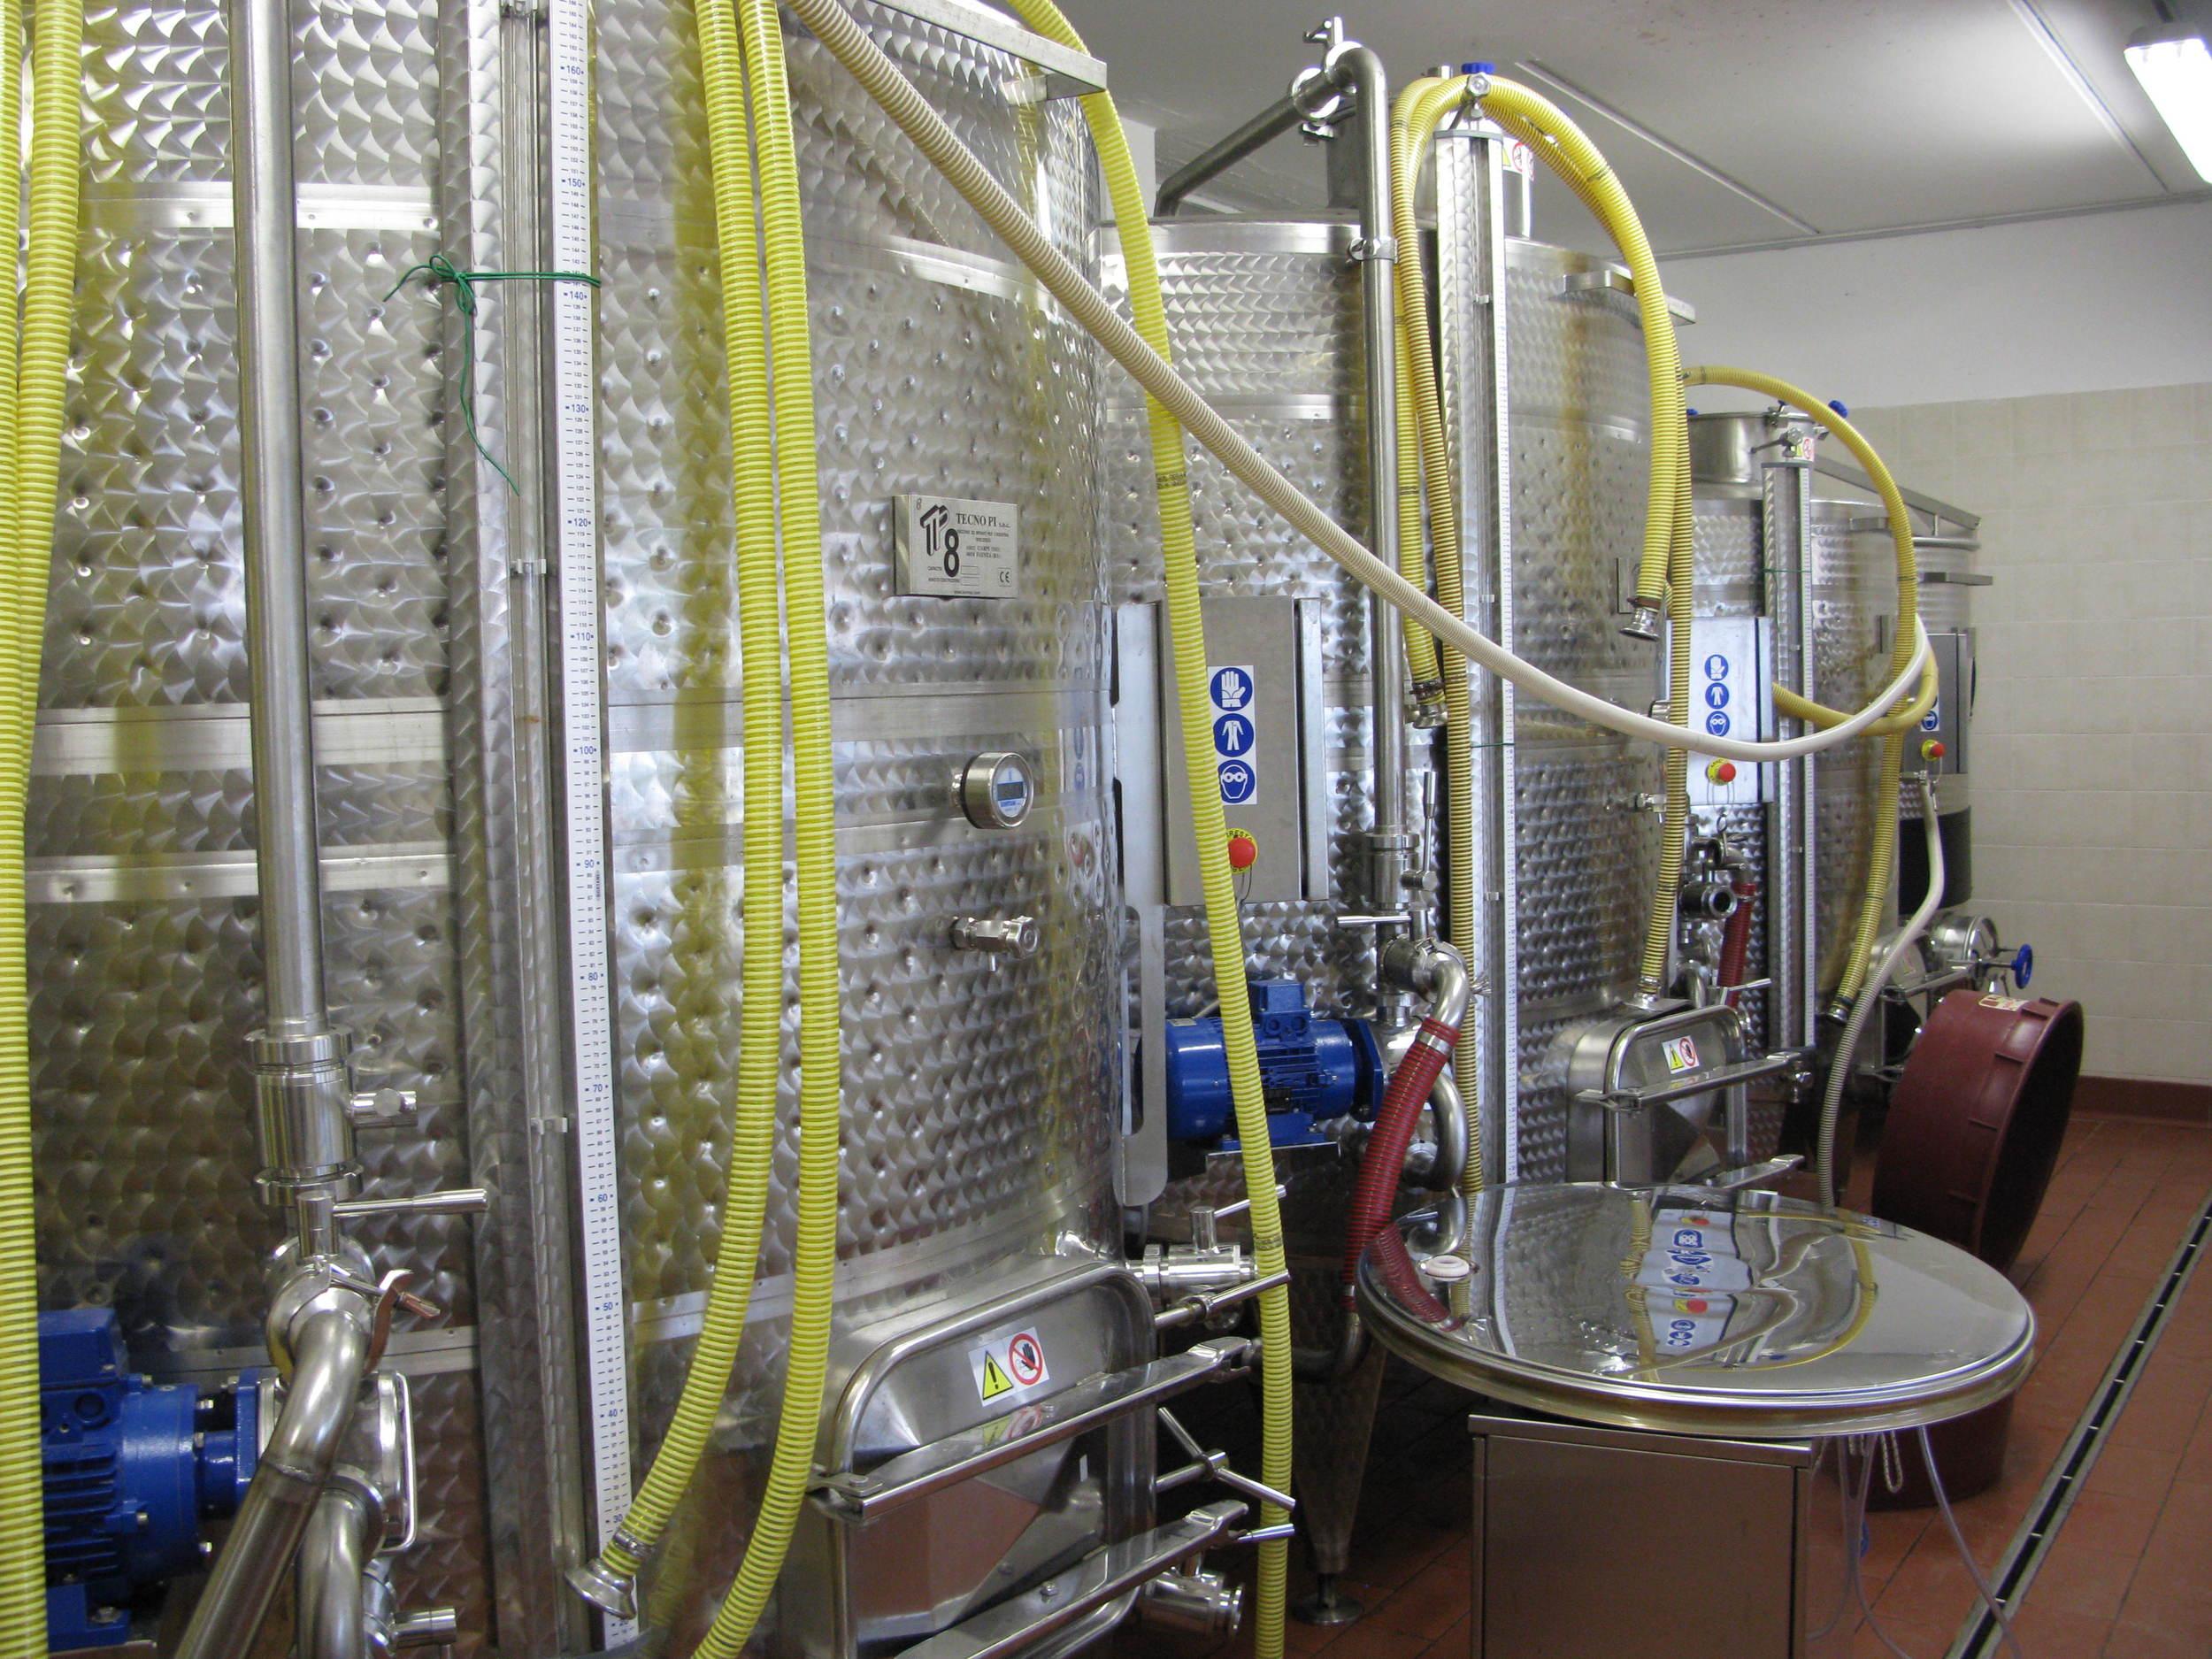 Fiorino Fiorentini's winery